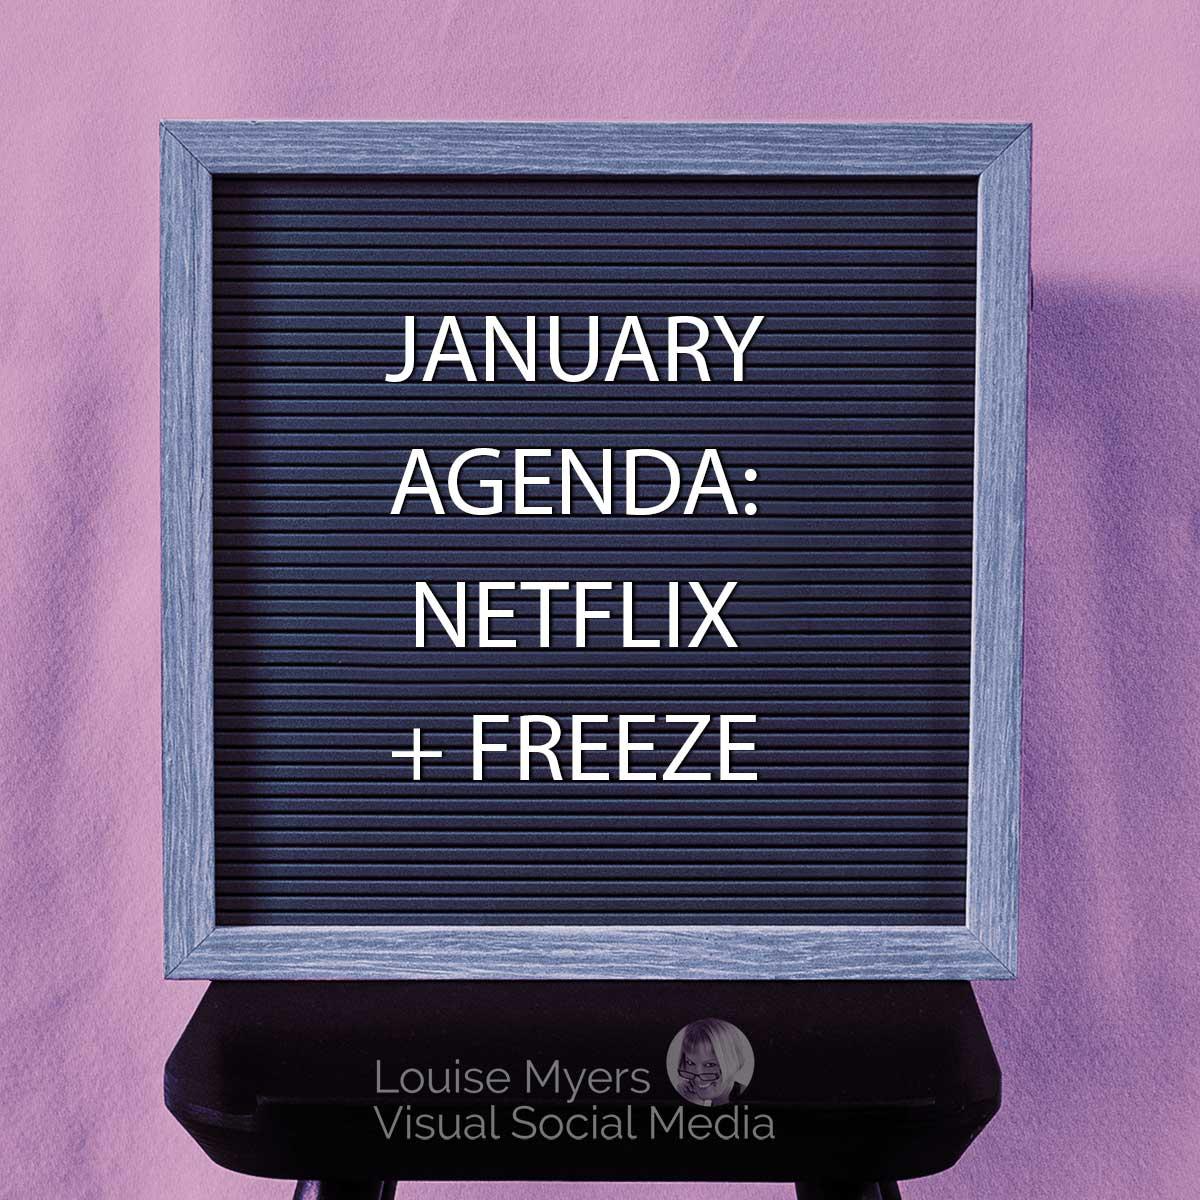 January agenda Netflix & freeze letter board quote.